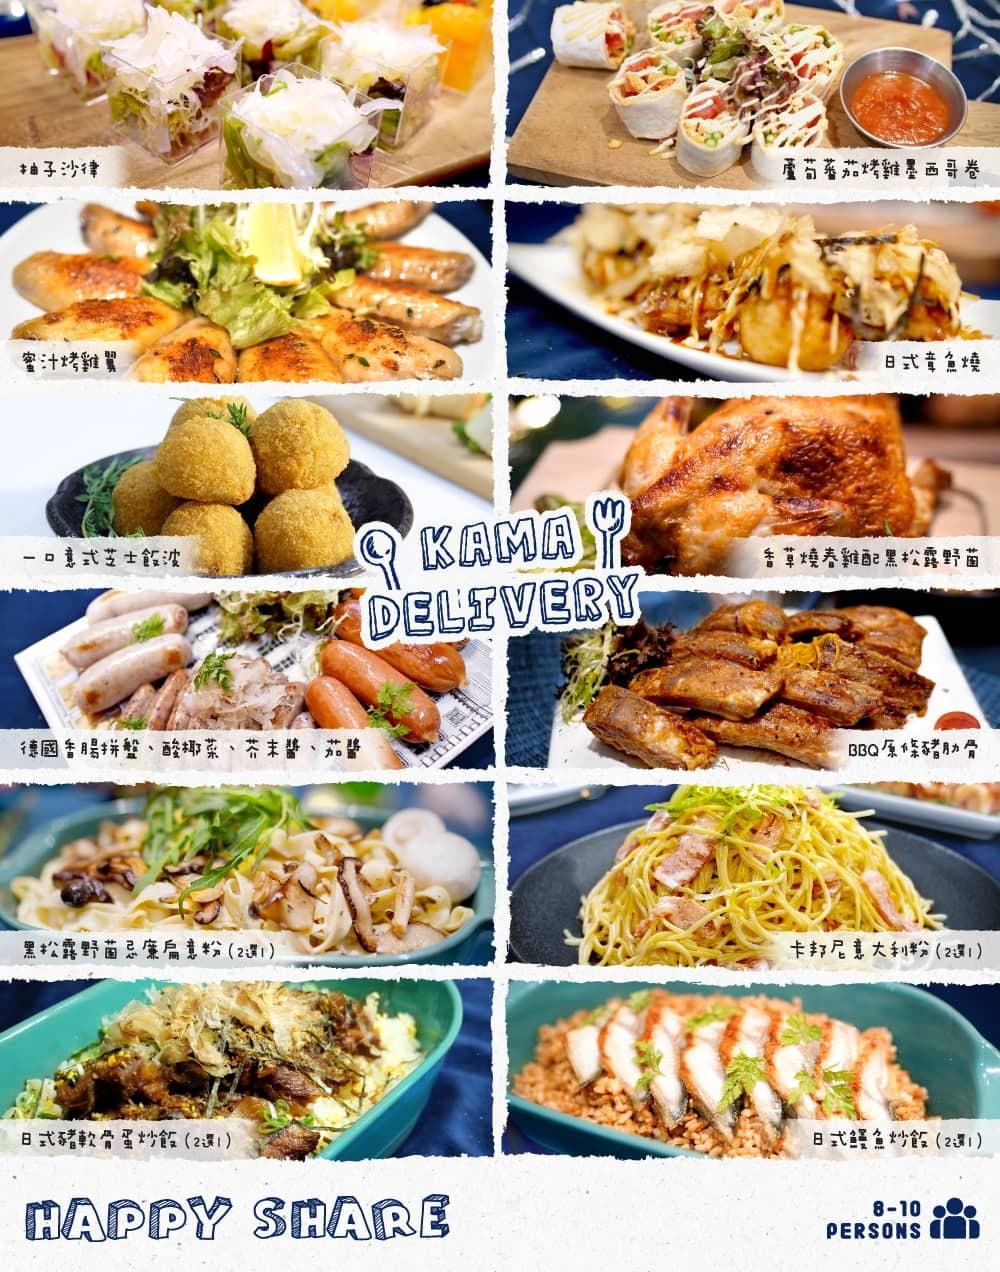 Kama Delivery推出的Happy Share Set套餐食物份量適合8-10人到會享用